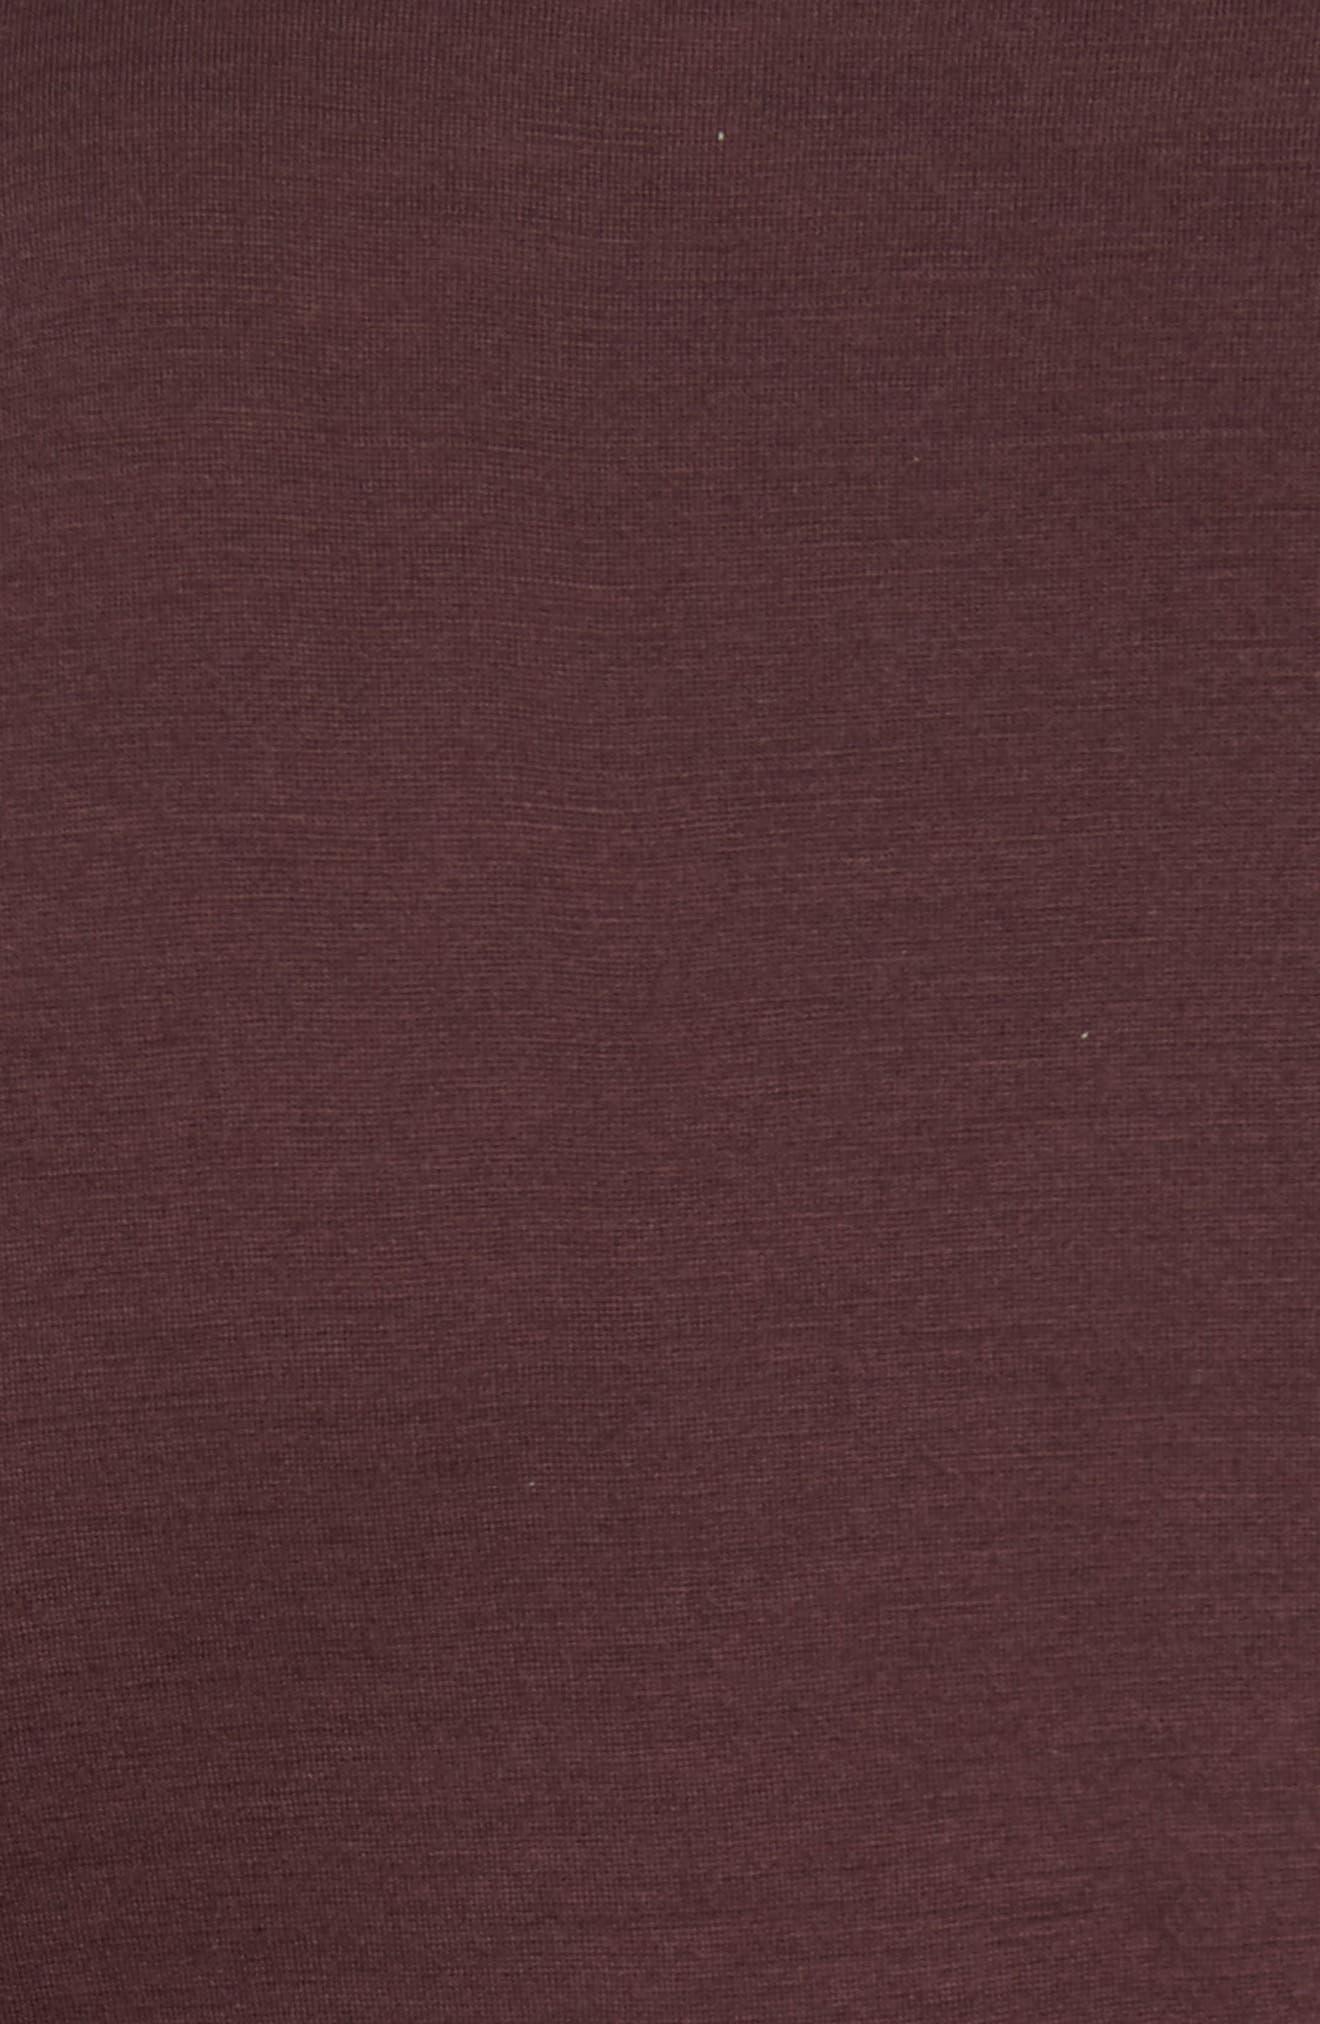 Mercerized Wool Long Sleeve T-Shirt,                             Alternate thumbnail 5, color,                             Hematite Red